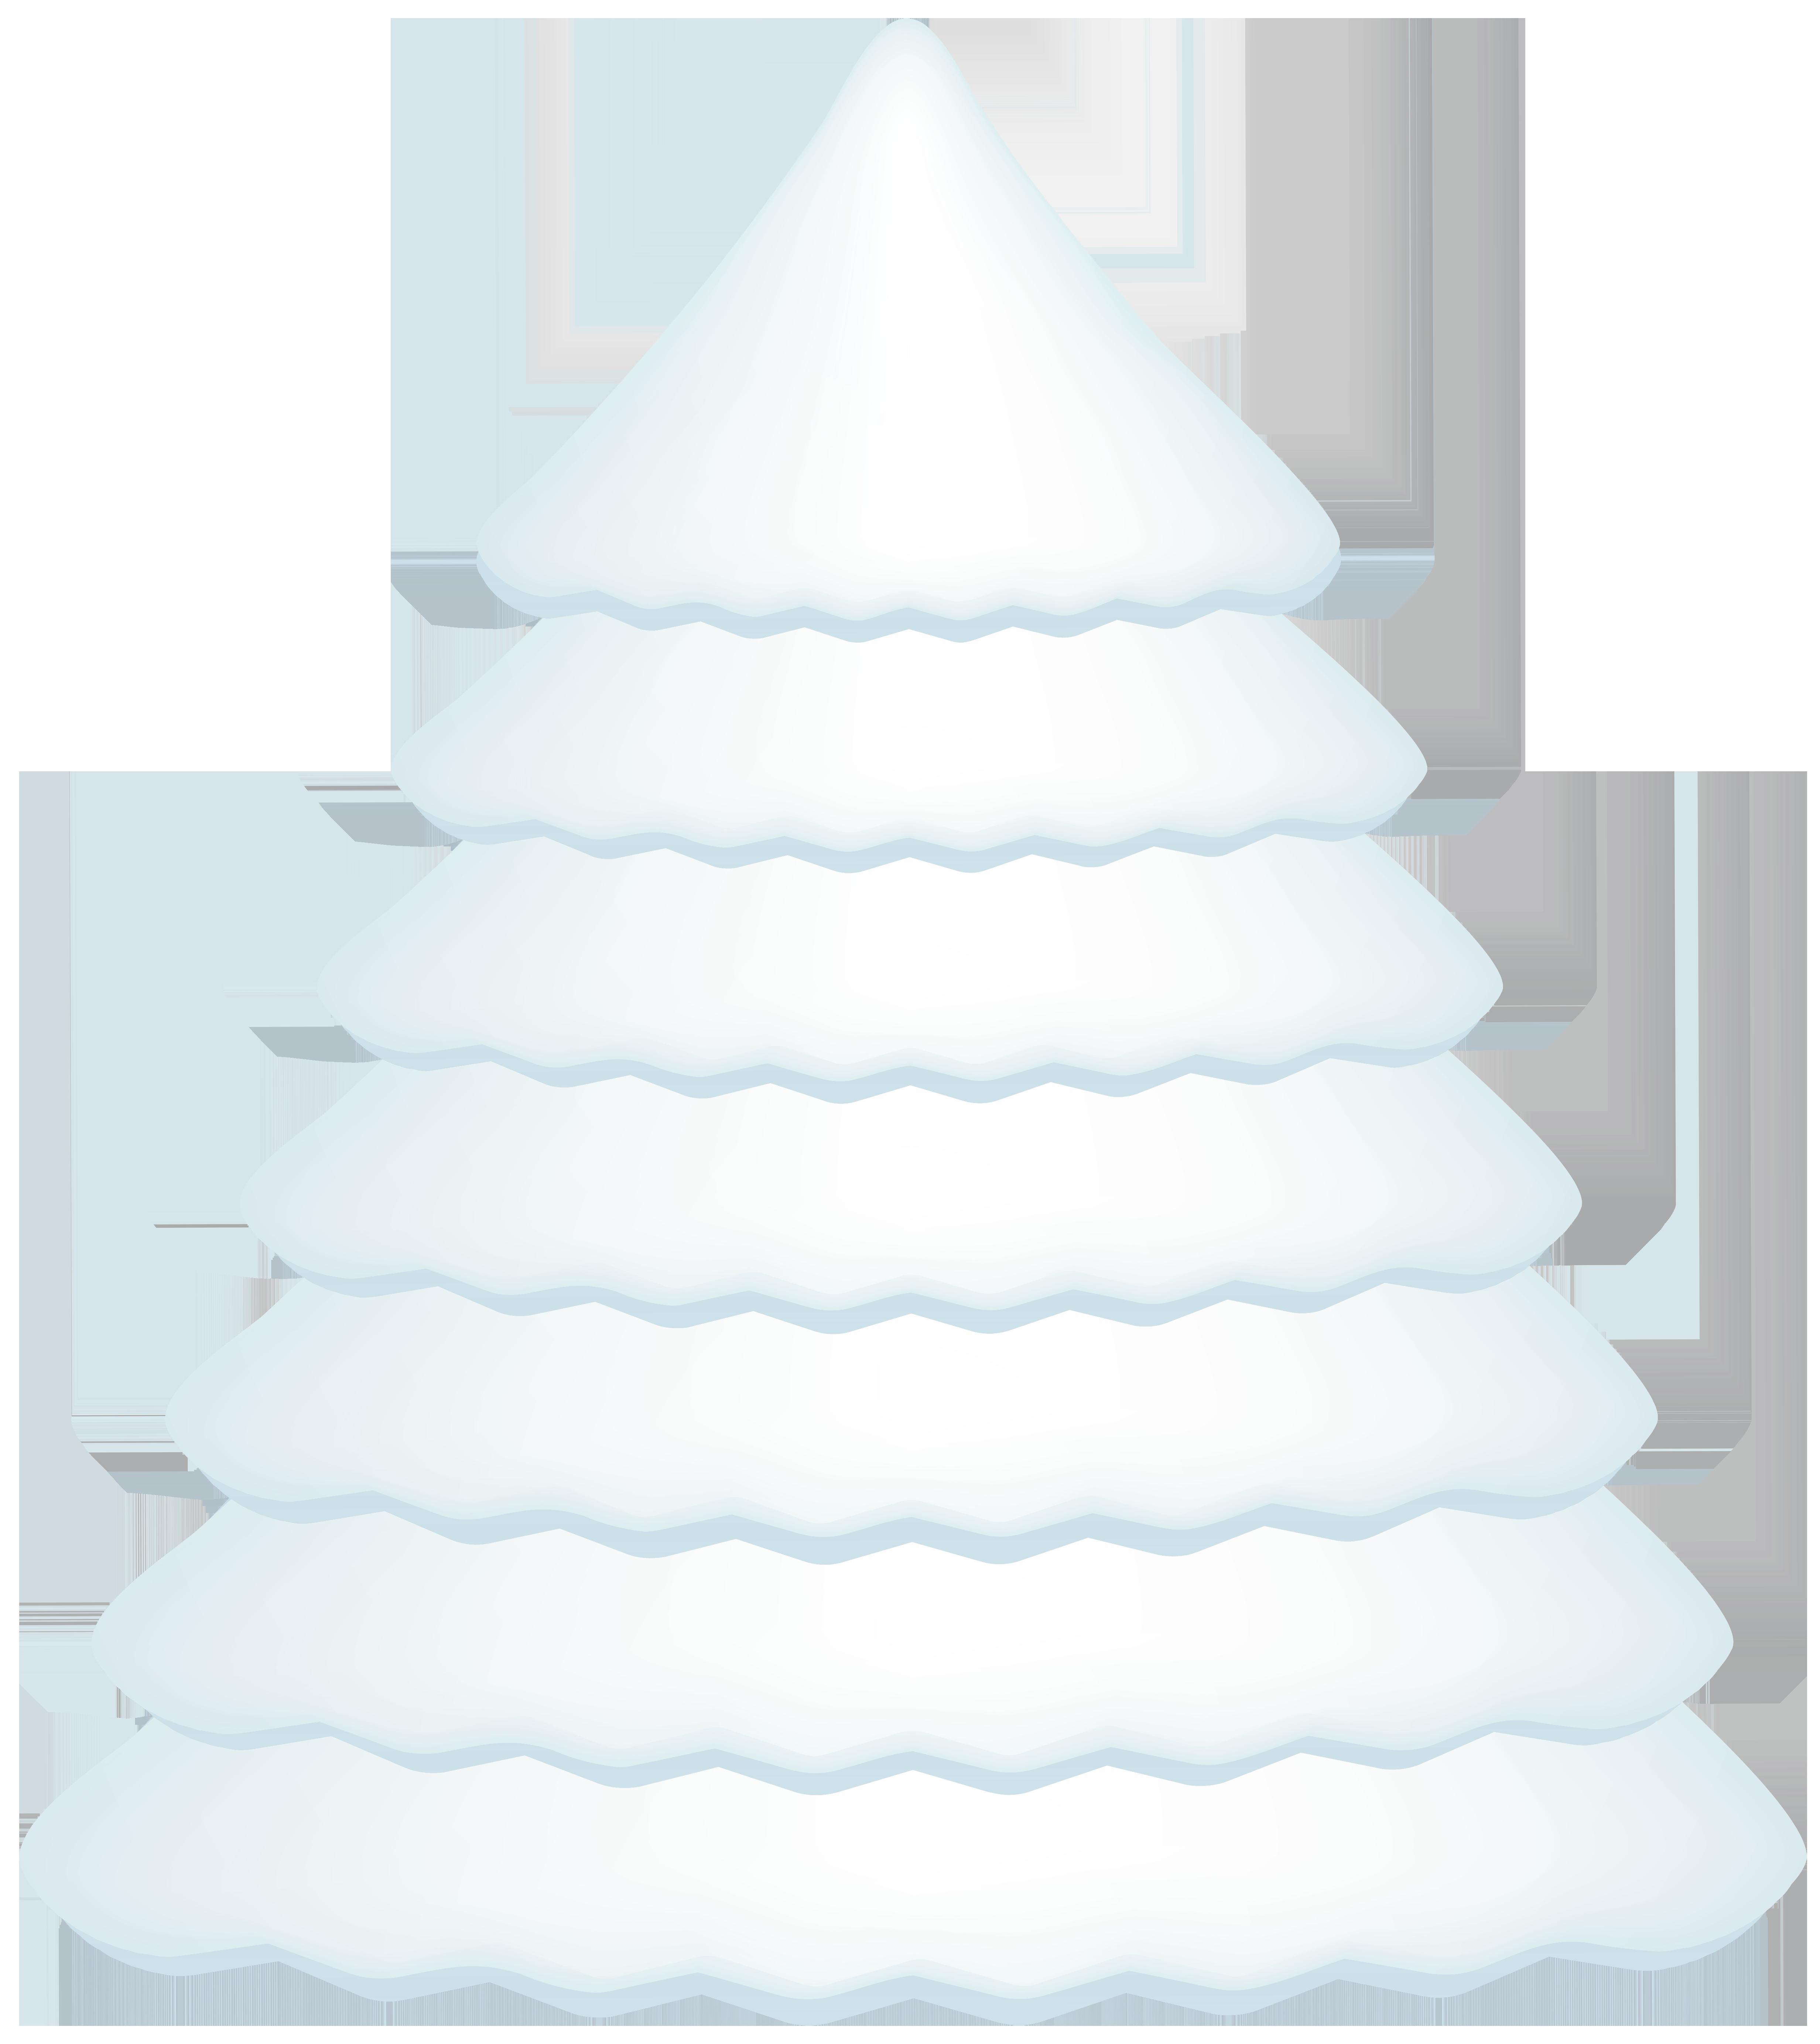 4928x5536 Snowy Pine Tree Transparent Png Clip Art Imageu200b Gallery